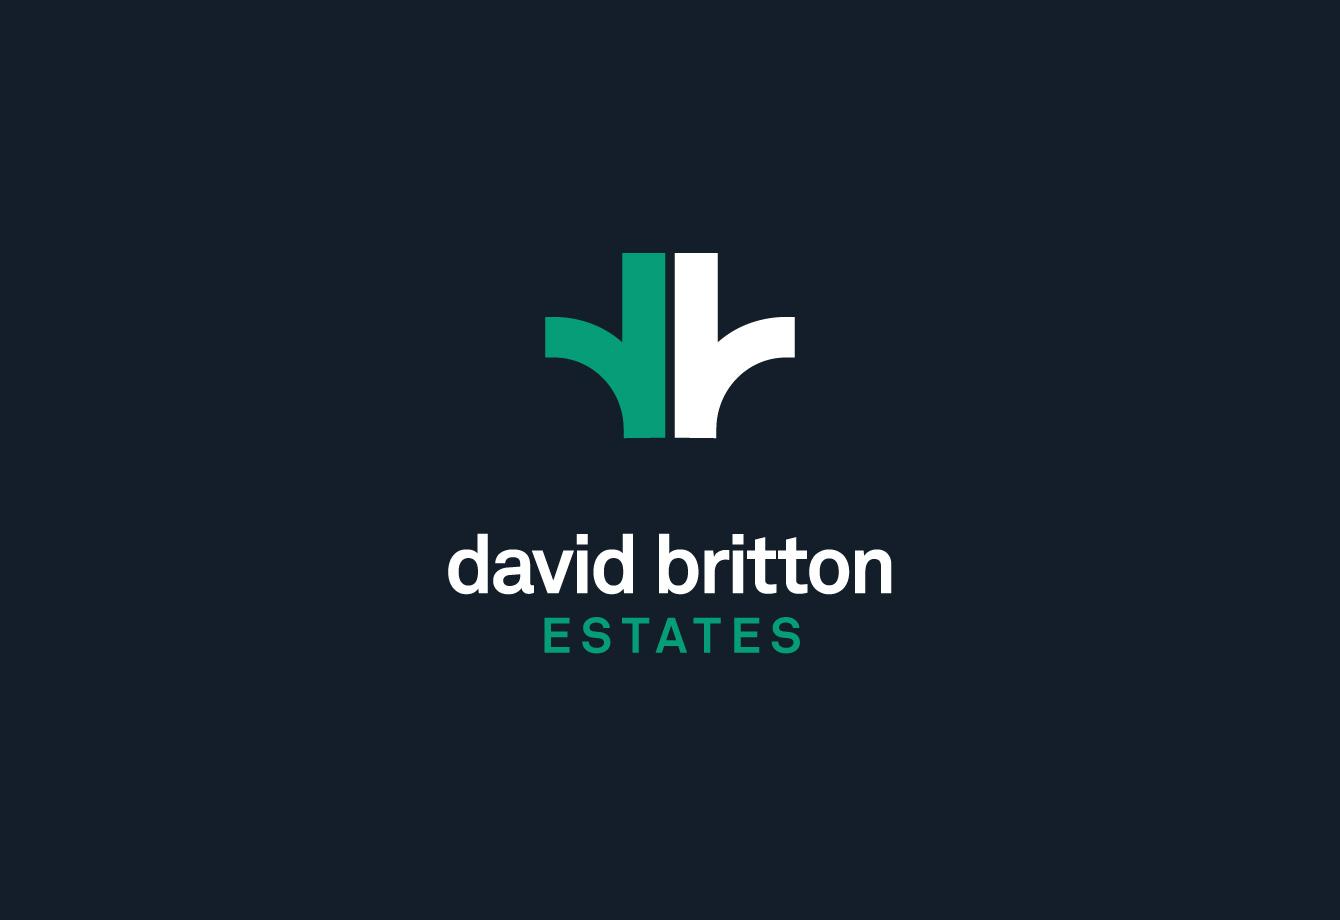 <b>David Britton Estates</b><br>Branding